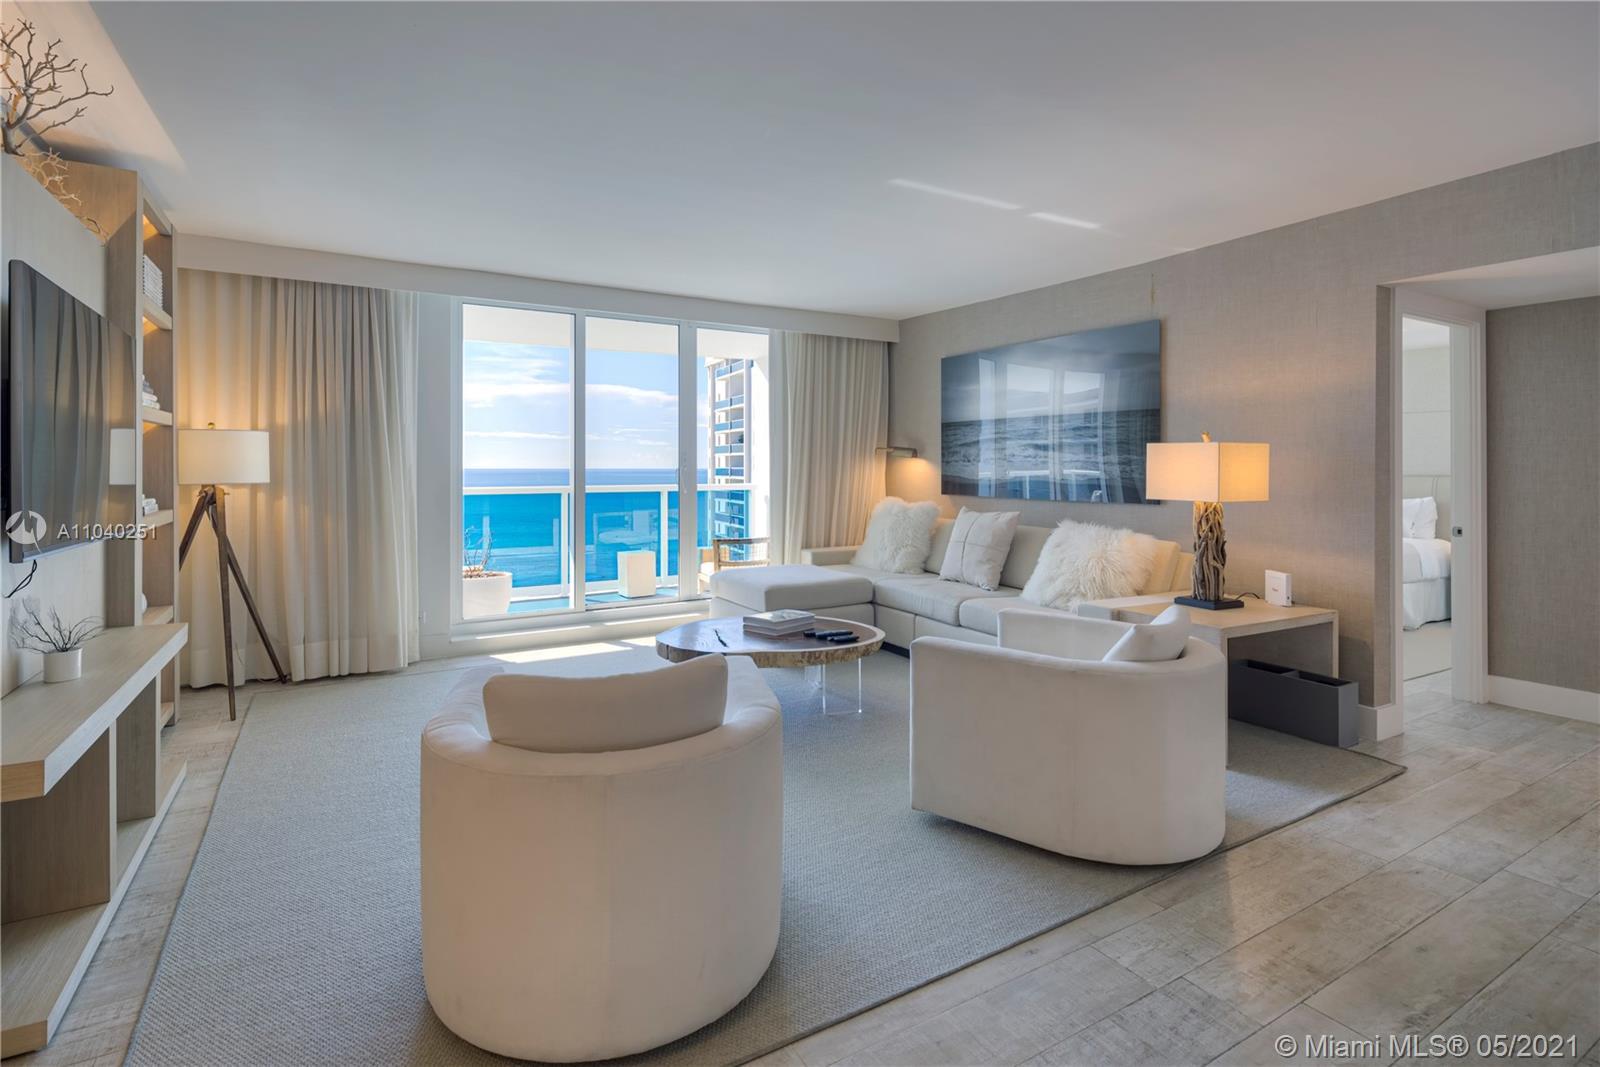 1 Hotel & Homes #1244 - 102 24th St #1244, Miami Beach, FL 33139